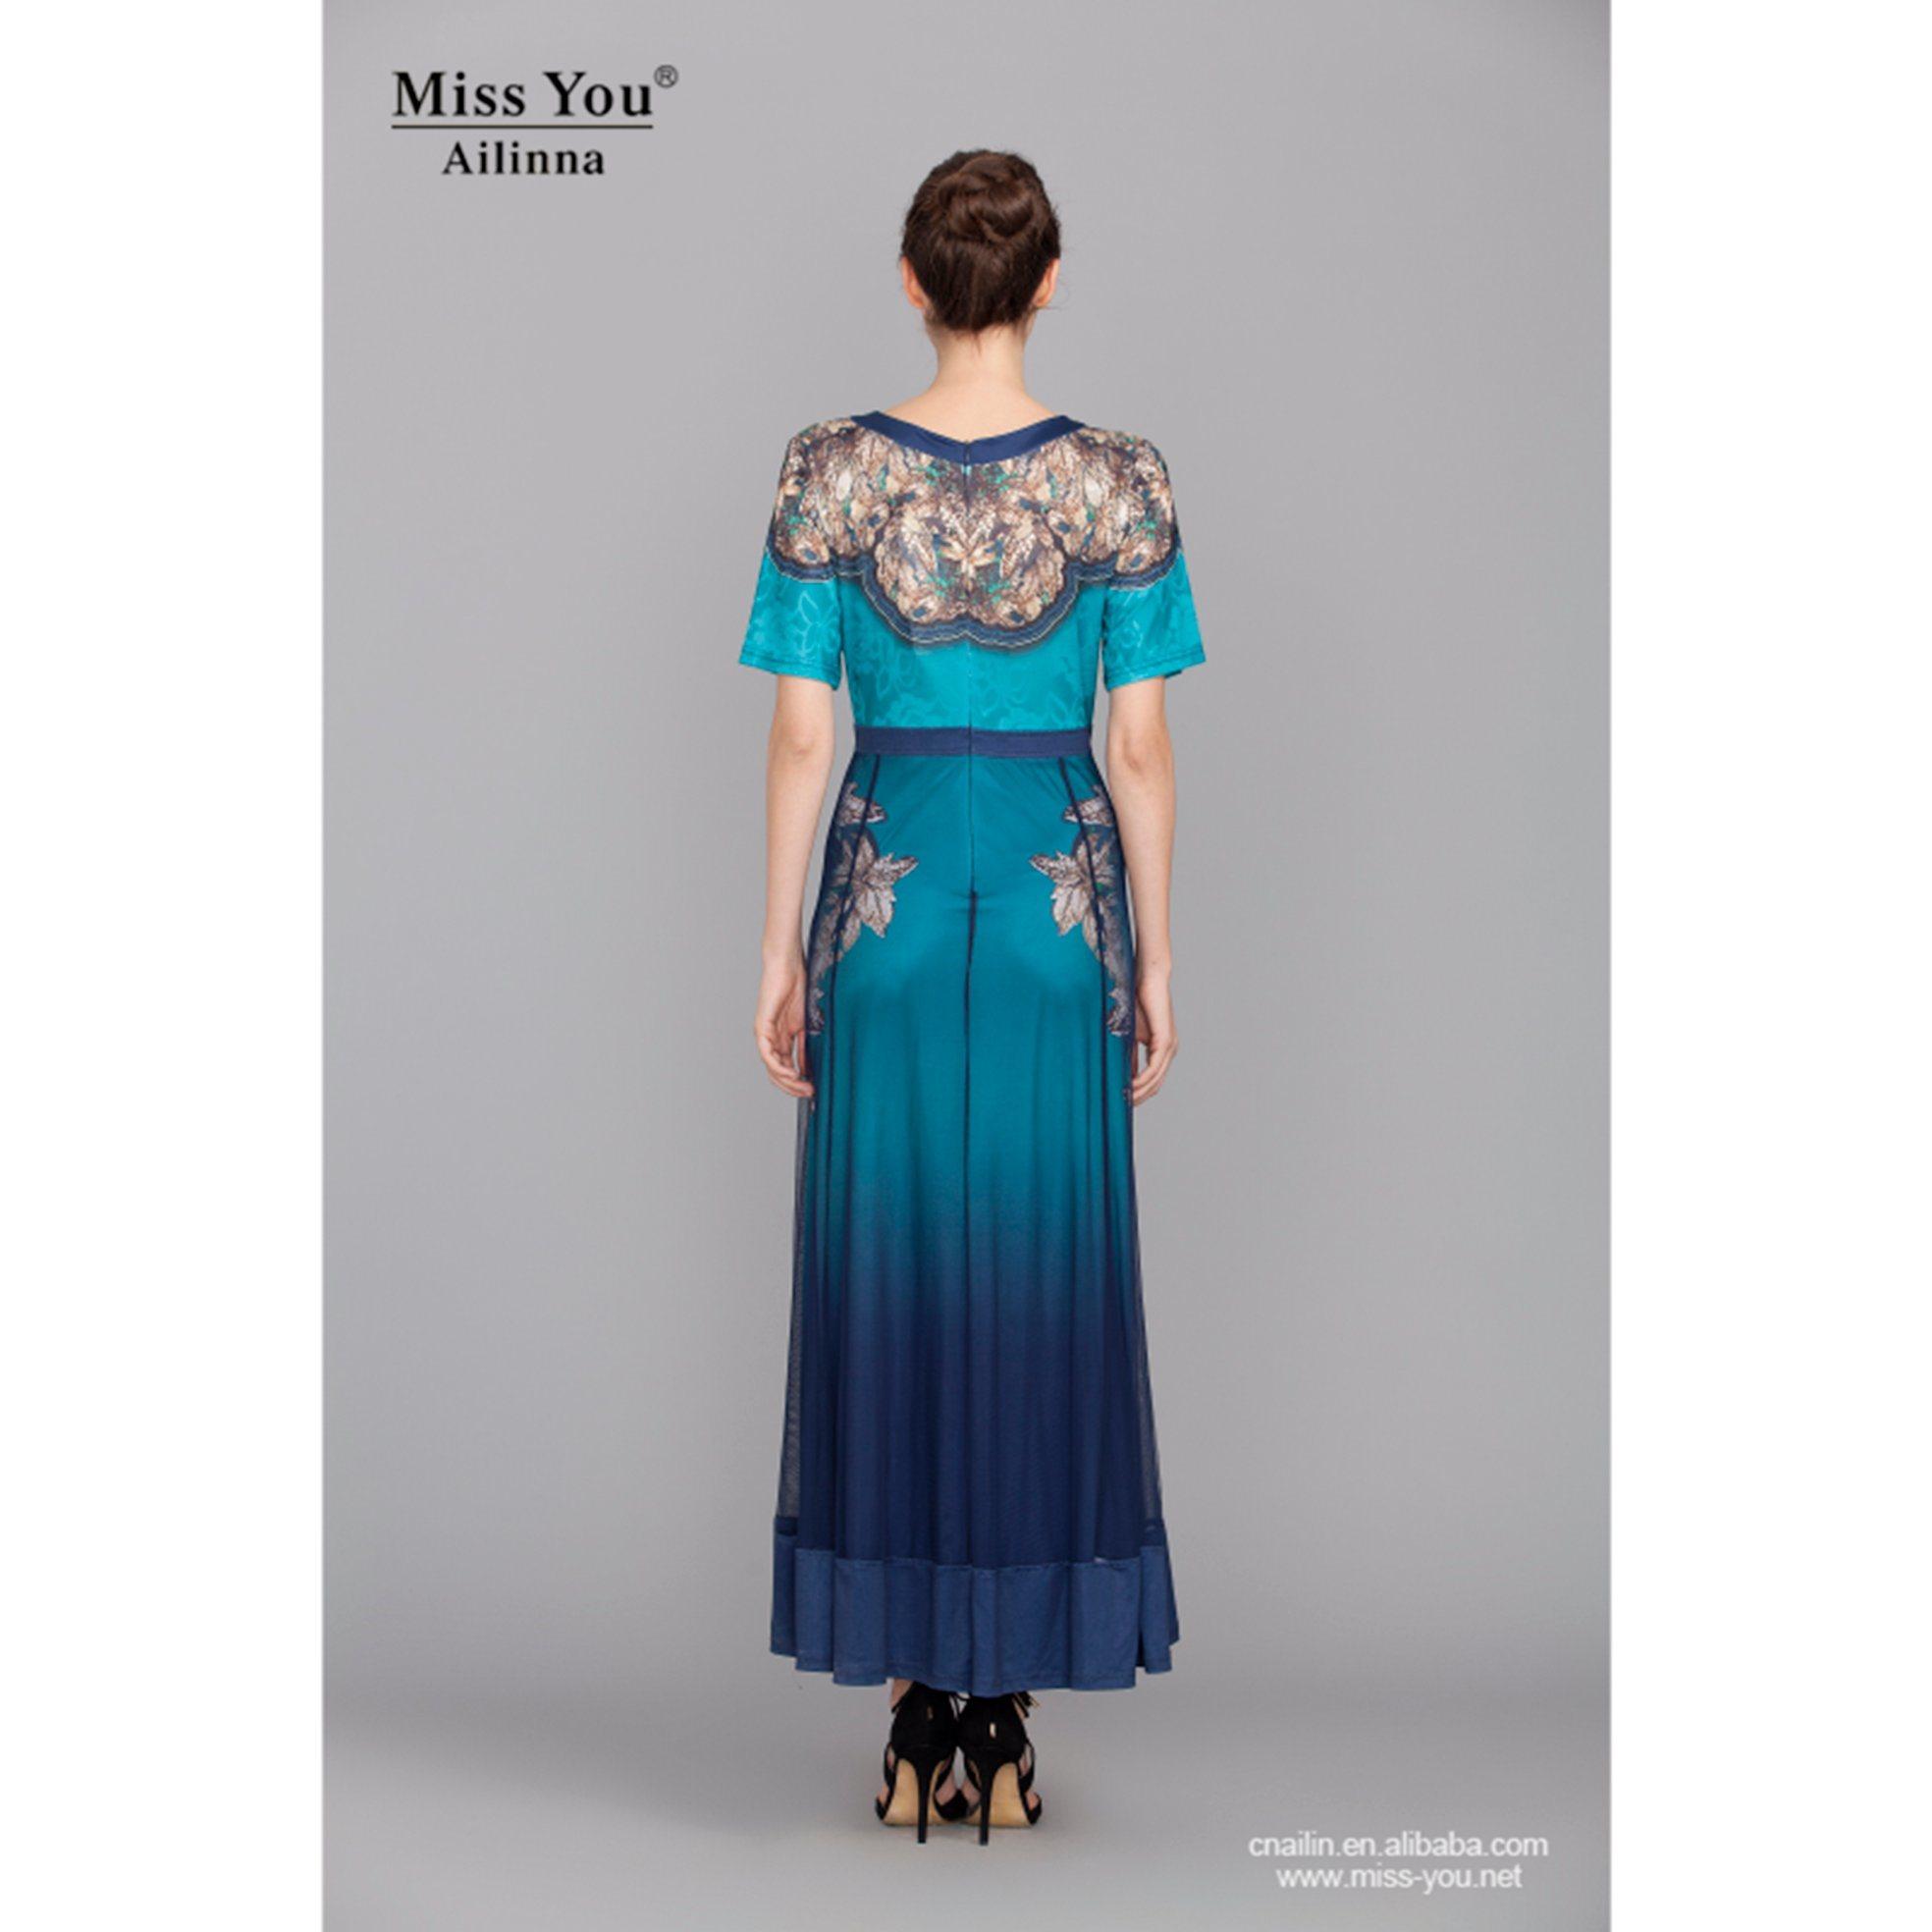 Miss You Ailinna 801412 Long Crystal Cotton Dress Distributor Printed Blue Beautiful Dress